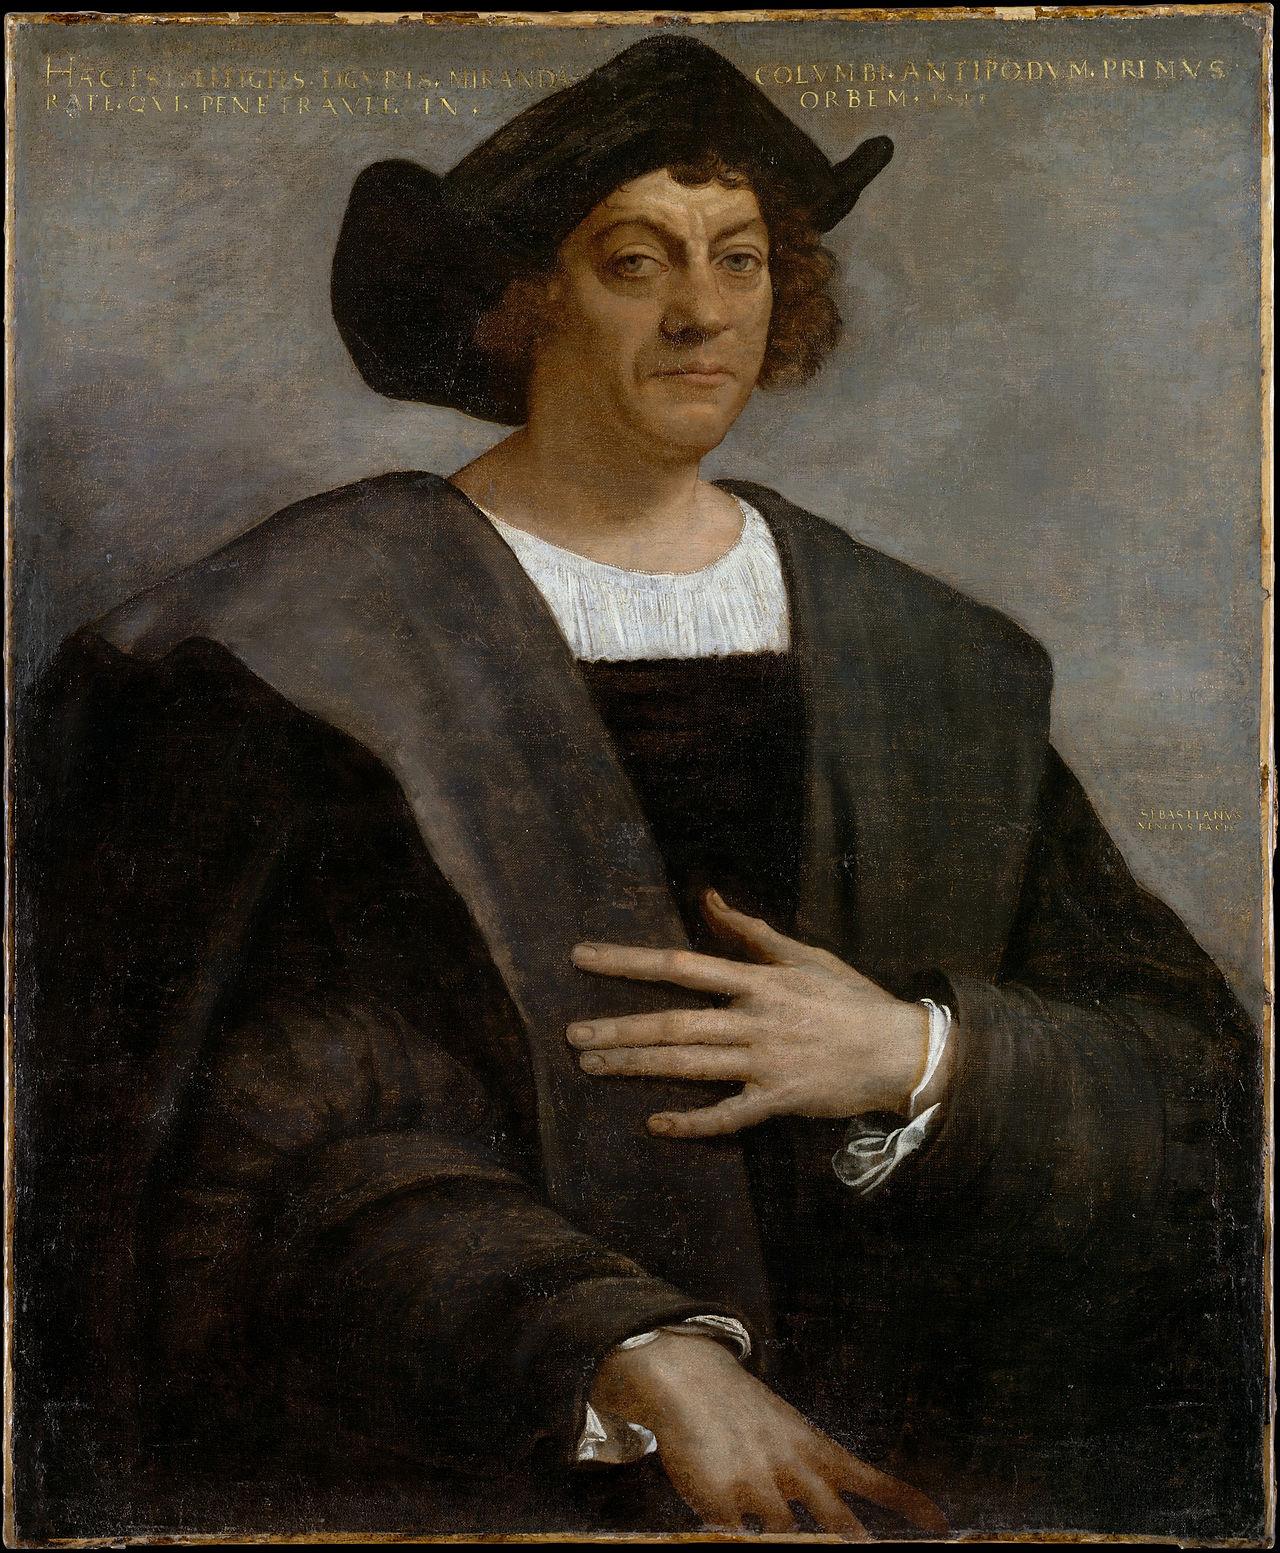 Cambridge joins movement to dump Columbus Day [video]